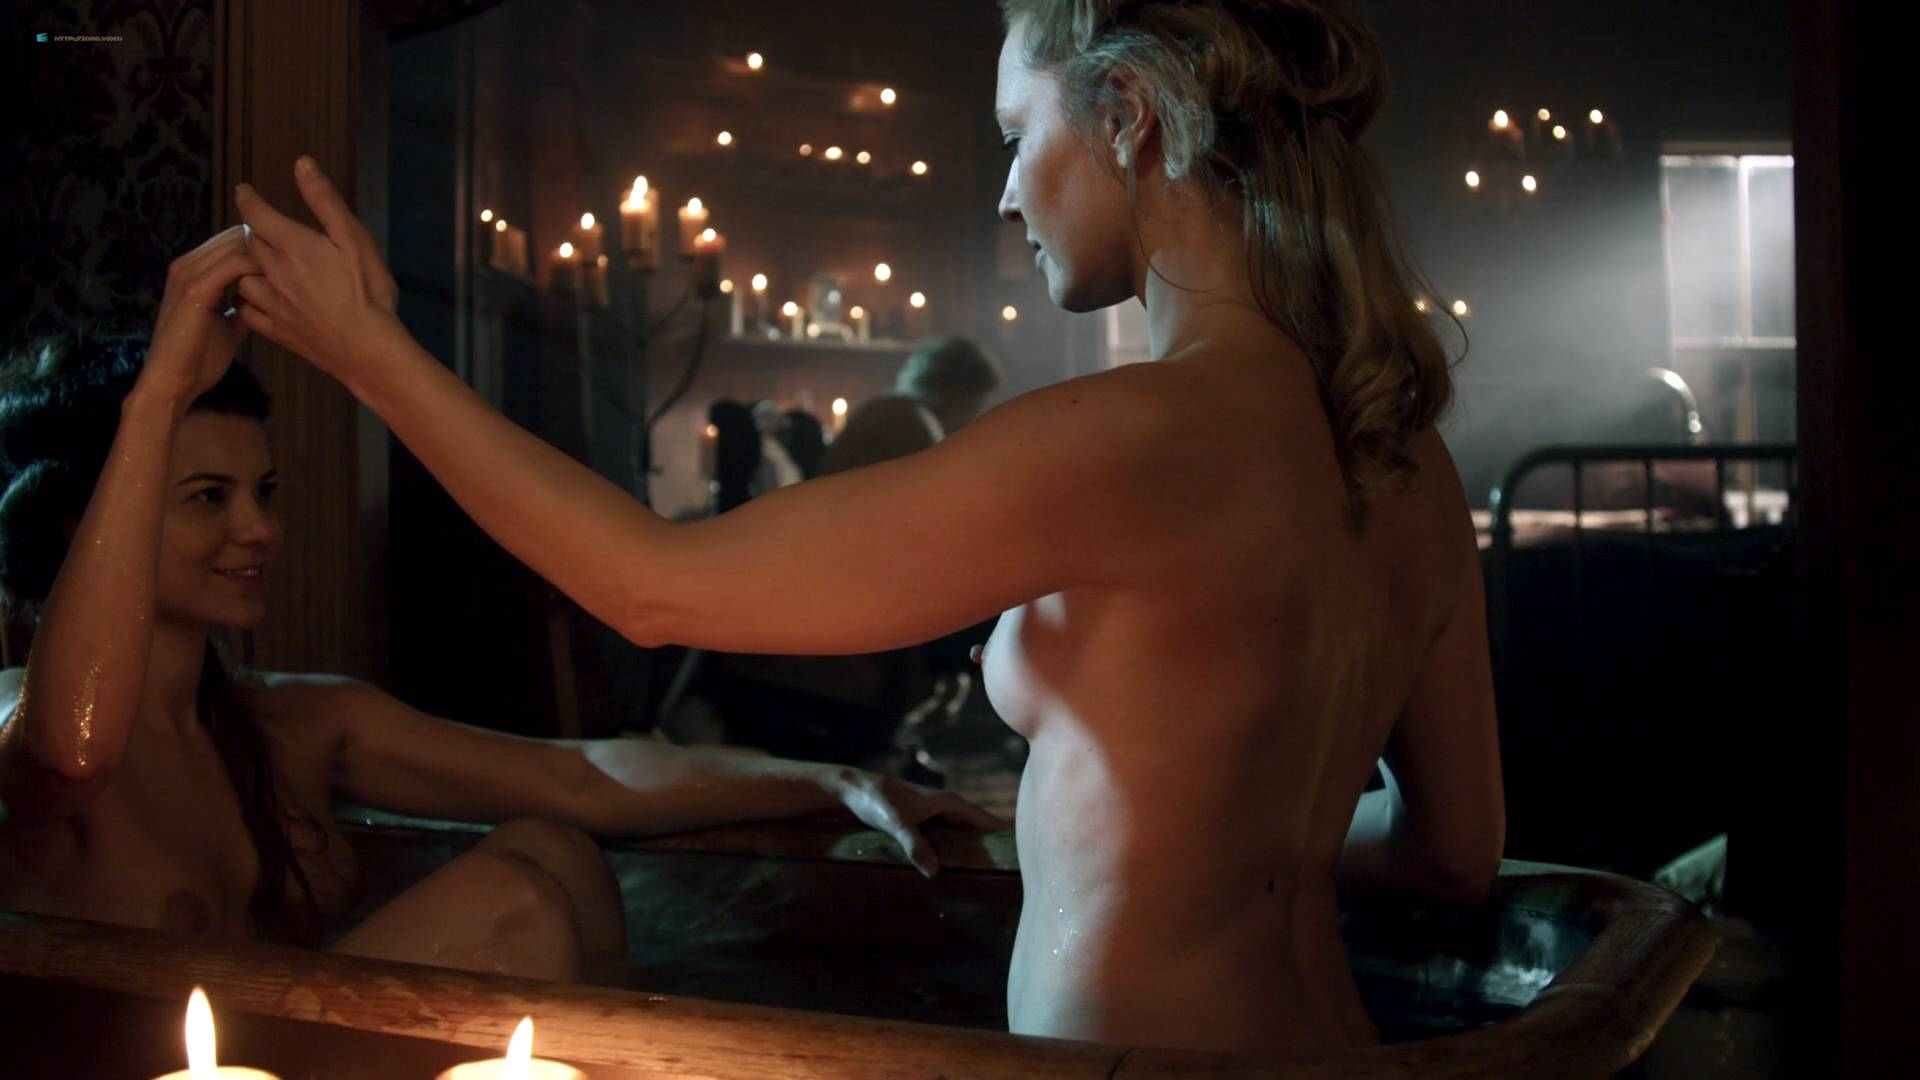 Elizabeth-Lavender-nude-topless-Elysia-Rotaru-nude-butt-boobs-Dead-Again-in-Tombstone-2017-HD-1080p-BluRay-09.jpg